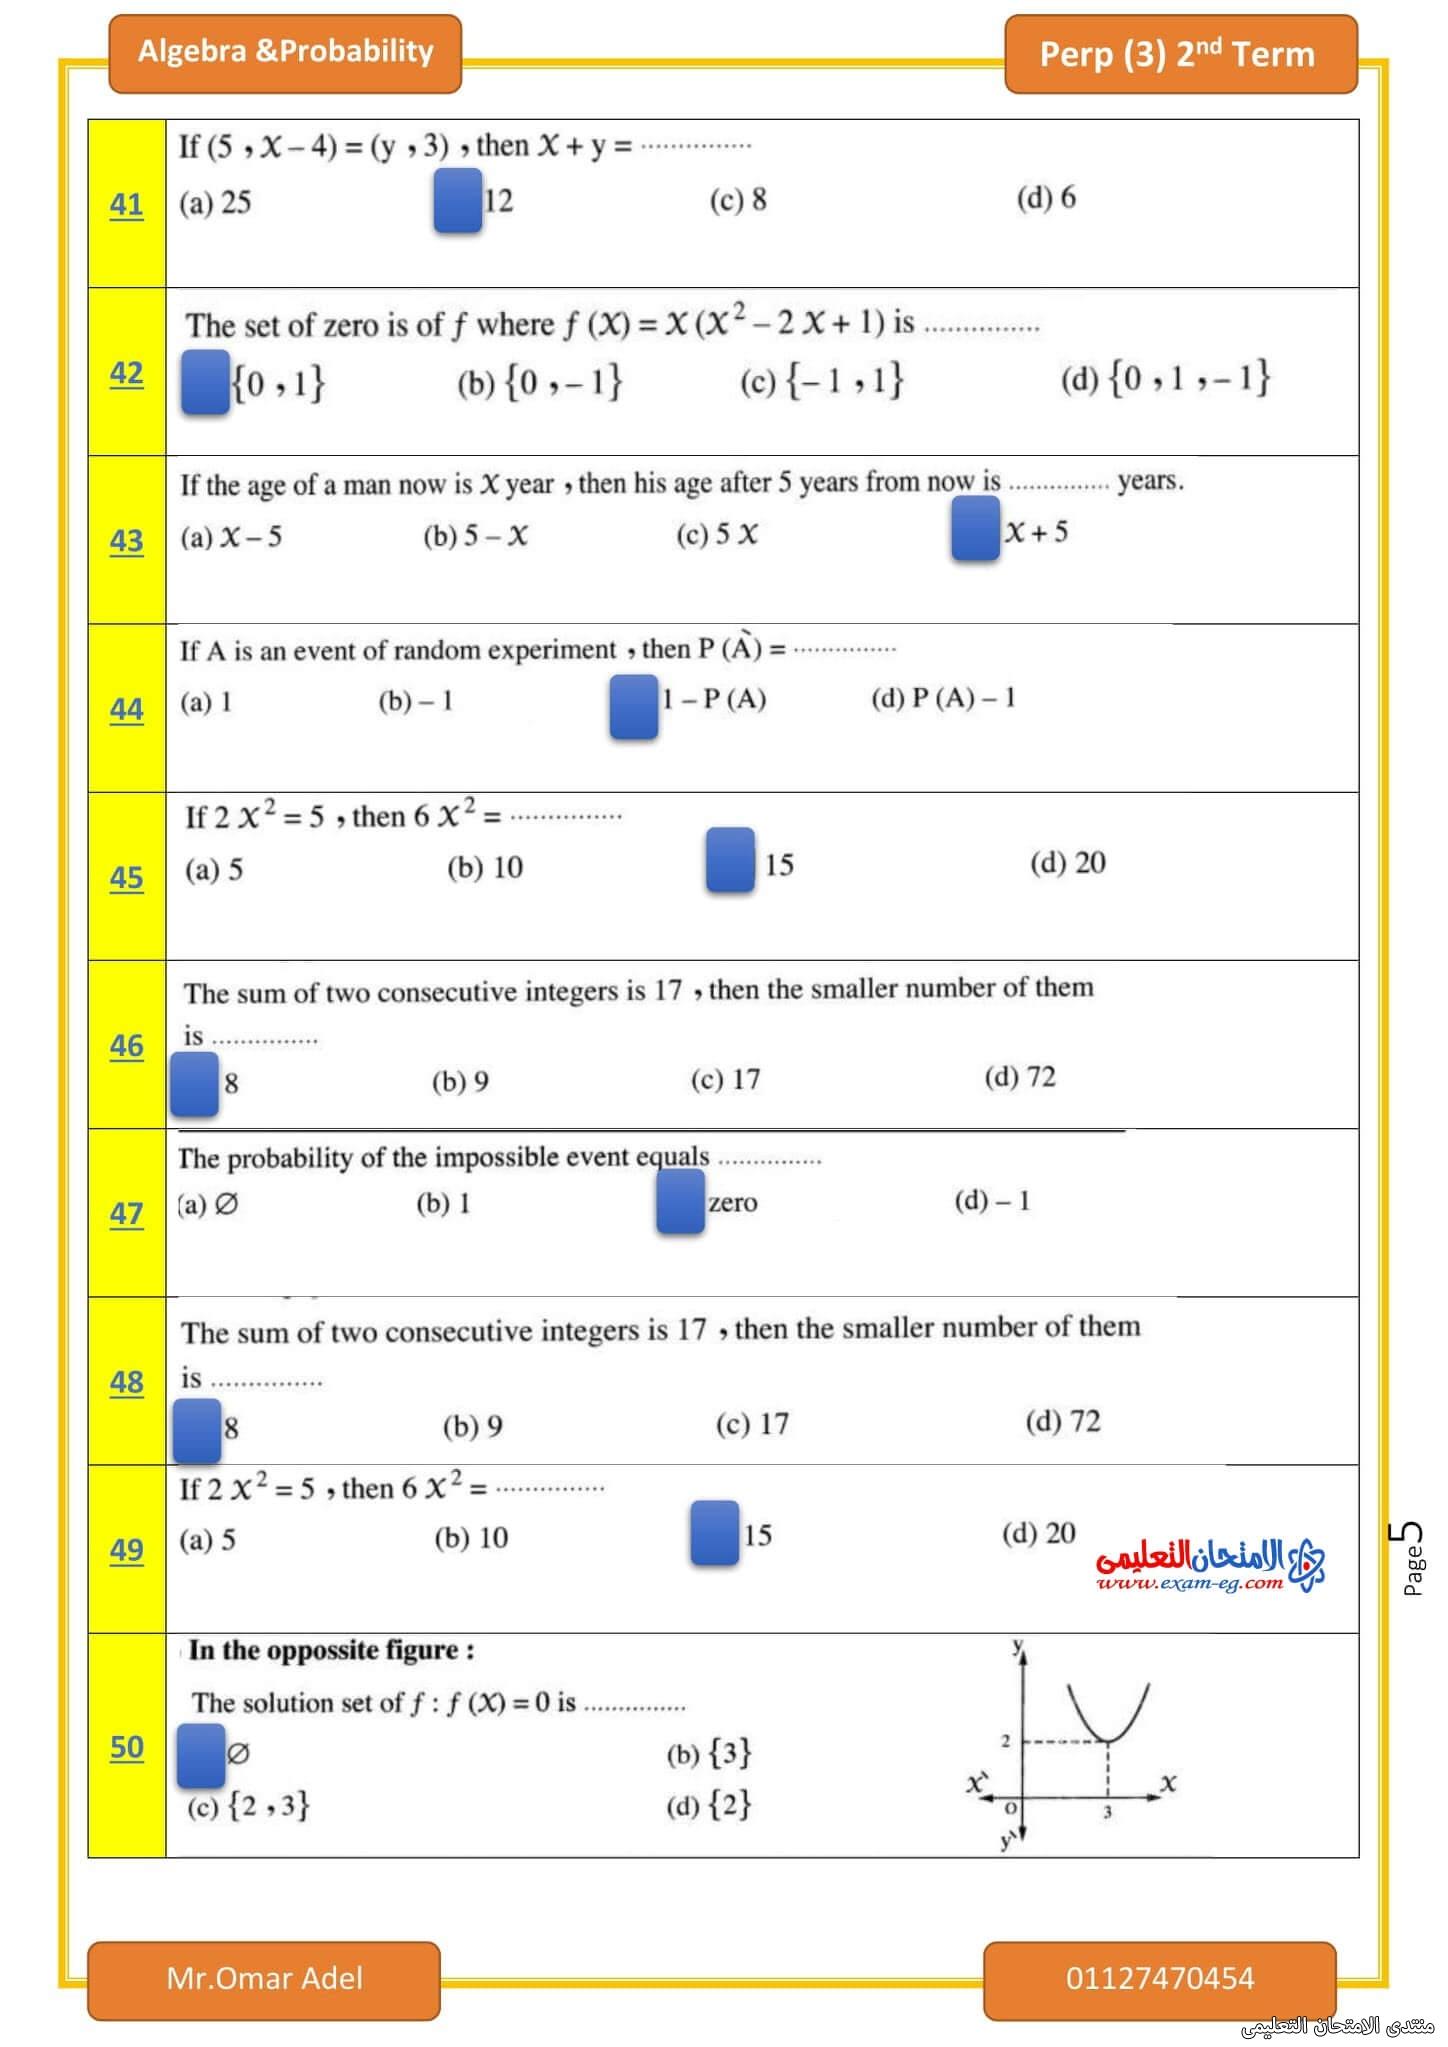 exam-eg.com_162115039218395.jpg